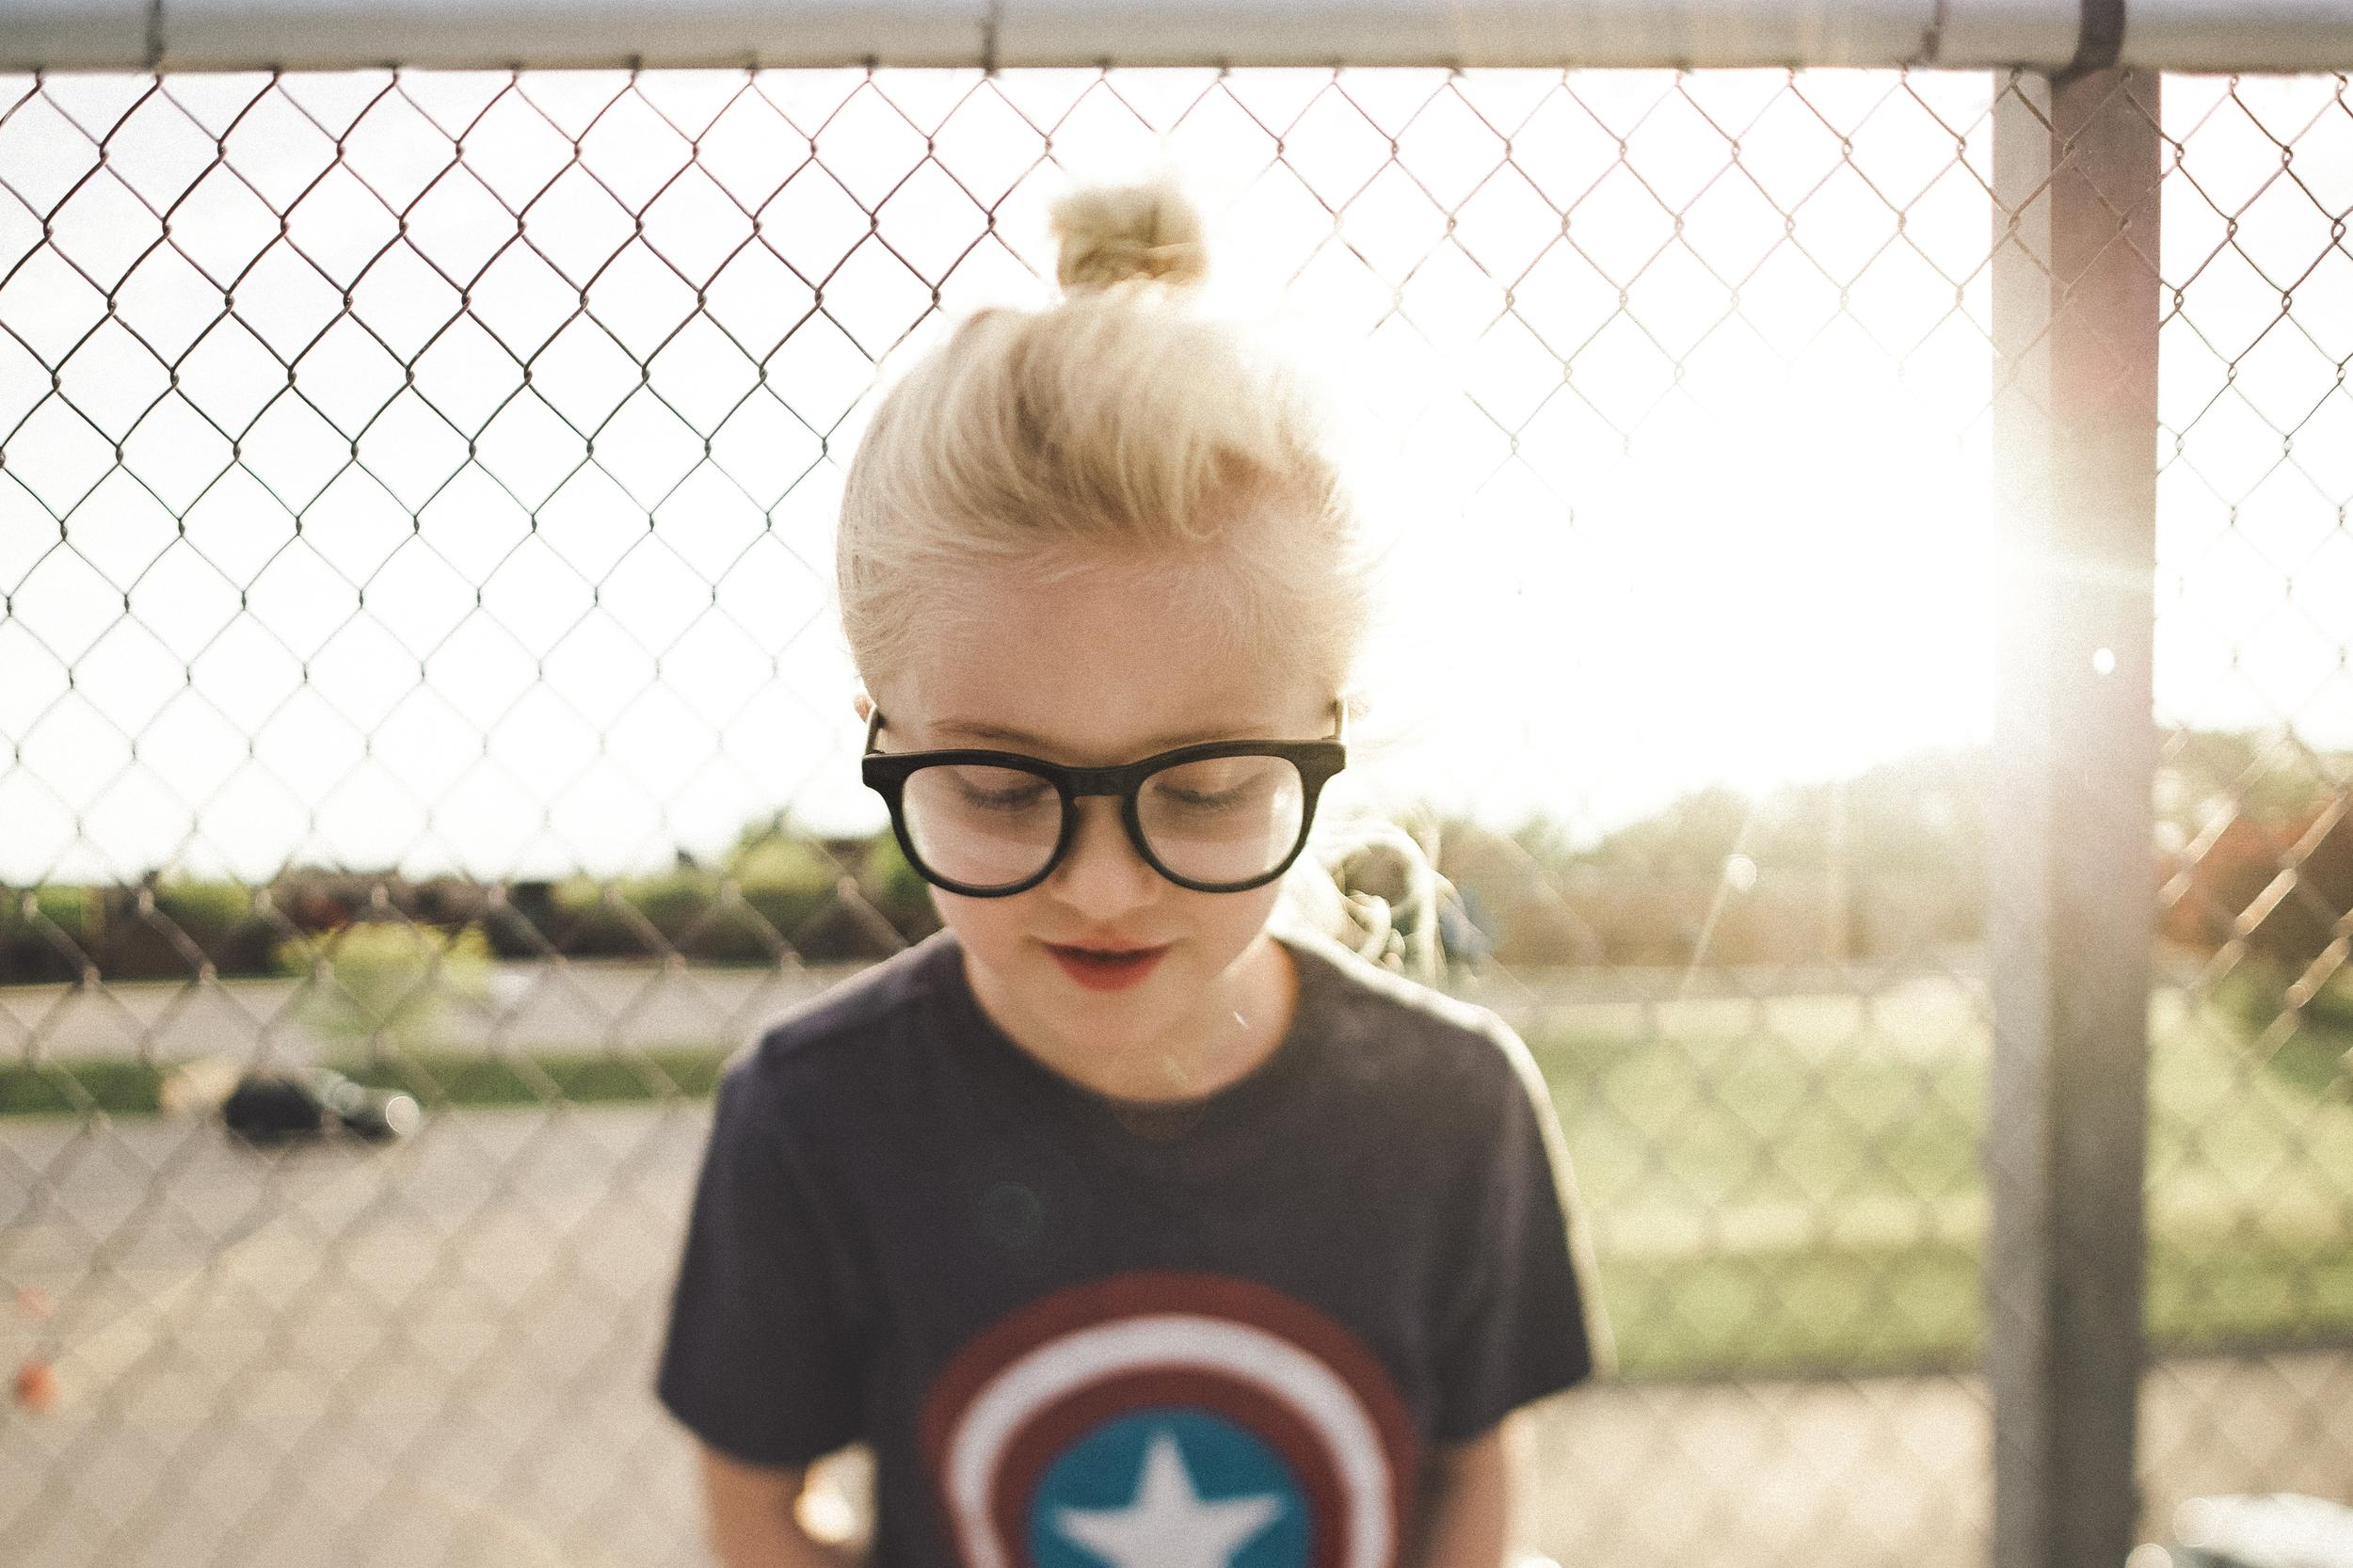 Hello-olivia-photography-long-island-family-children-childrens-lifestyle-photographer-captain-america-girl-glasses-nerd